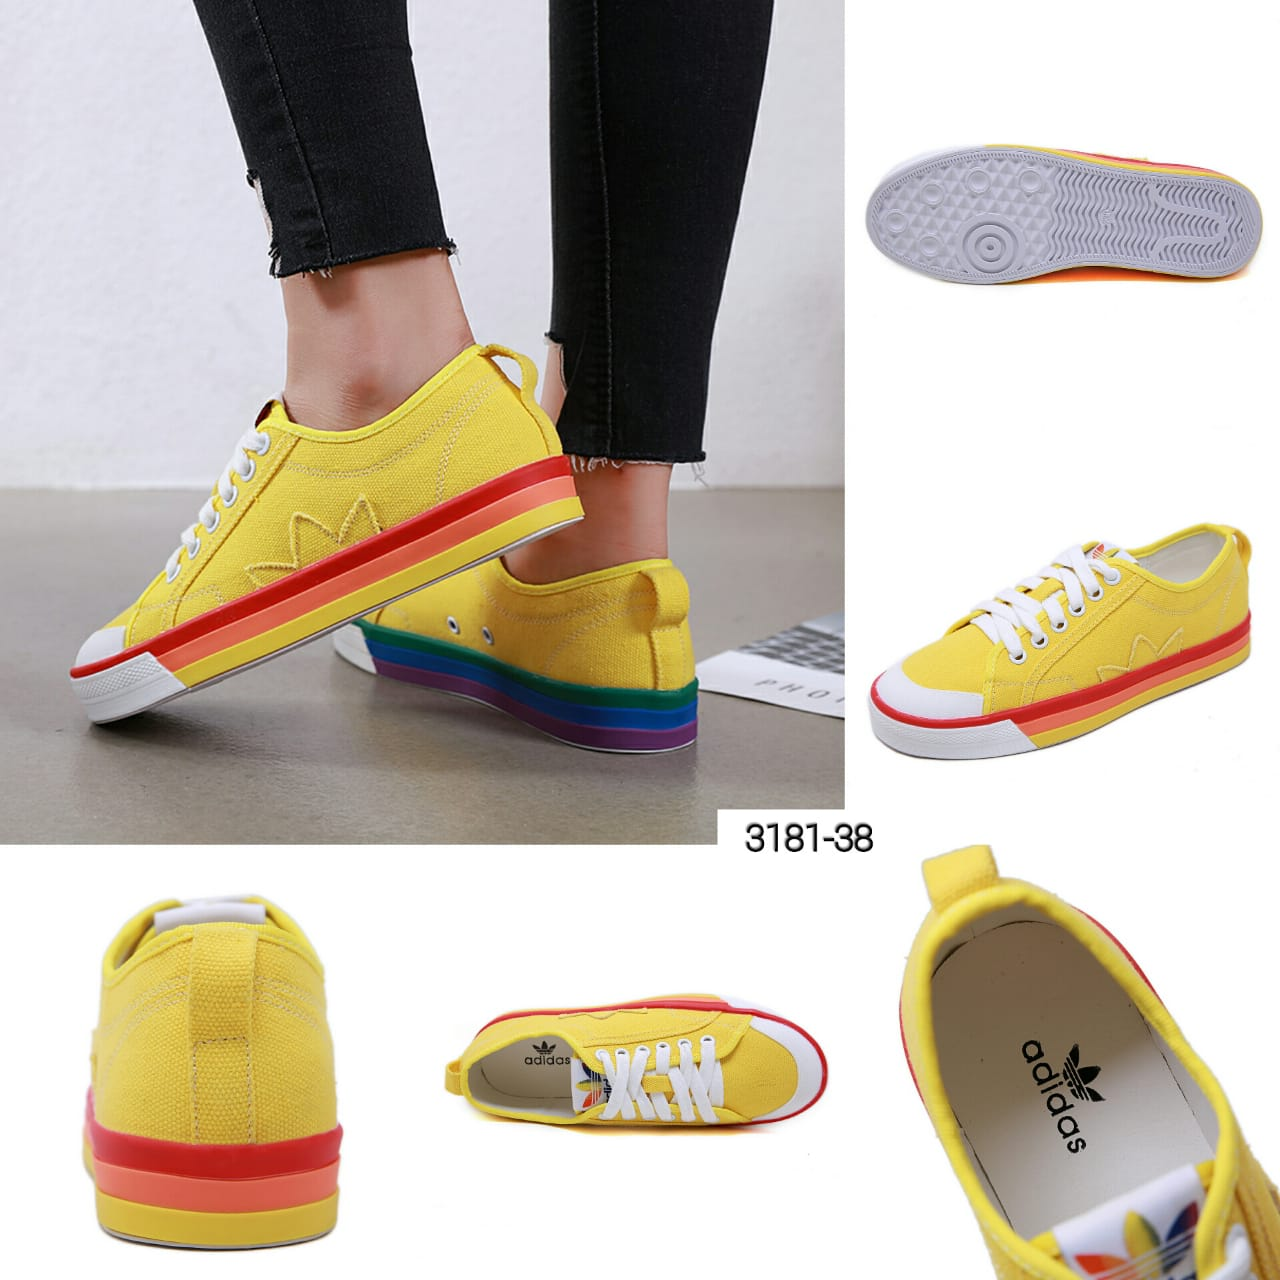 sepatu wanita import murah meriah 2020 3181-38MRsepatu wanita branded batam,sepatu wanita shopee,sepatu wanita casual